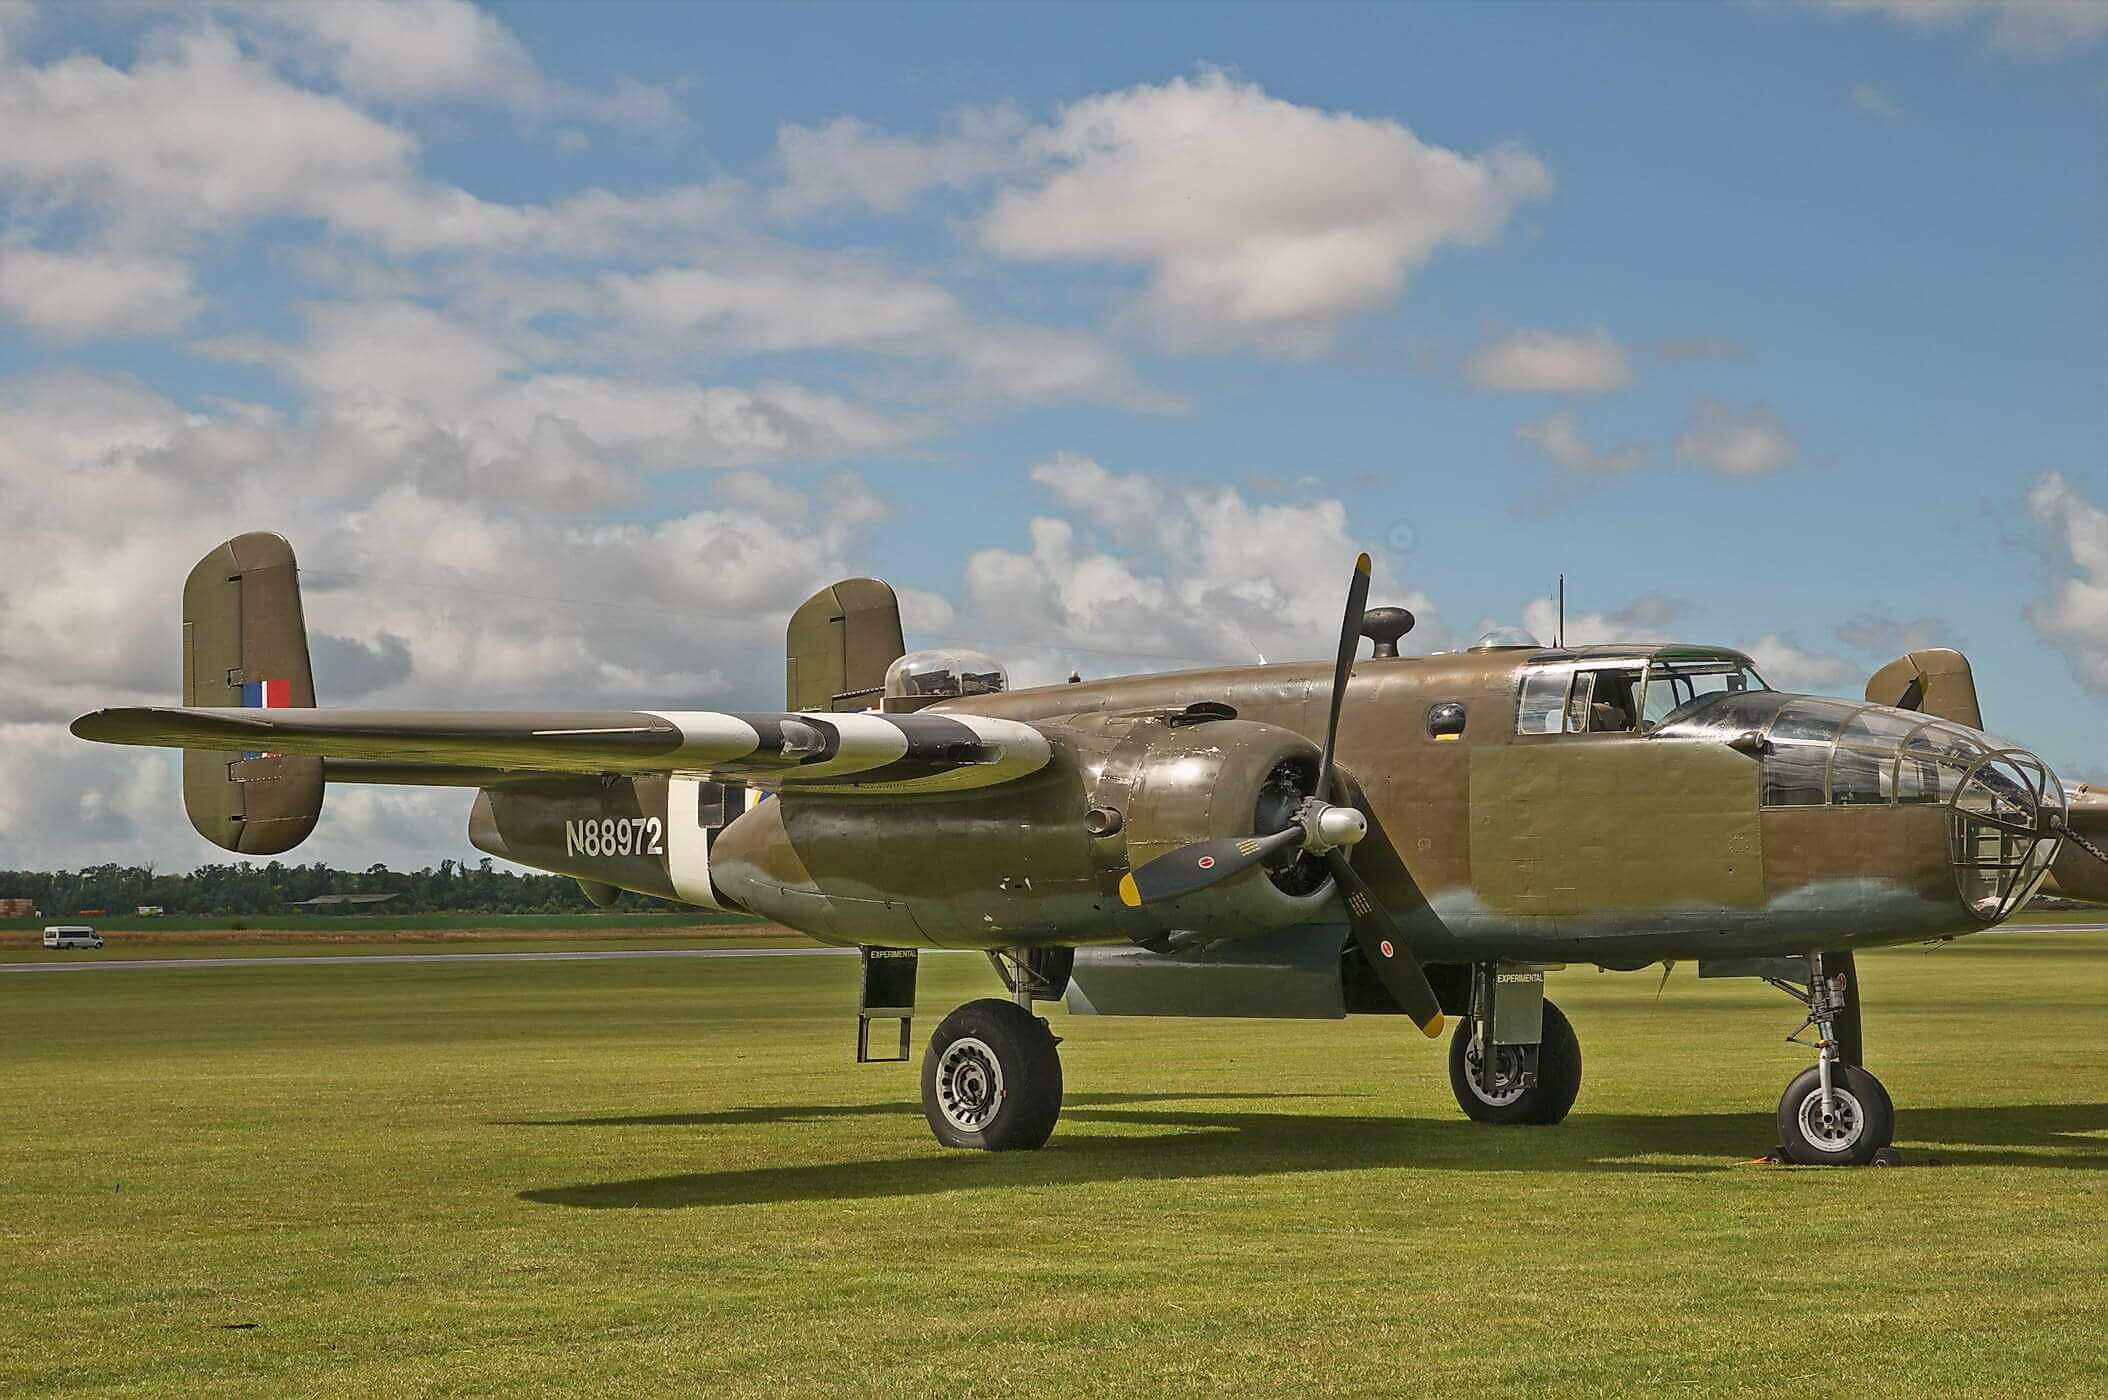 B-25D-30 Mitchell 43-3318-KL.161